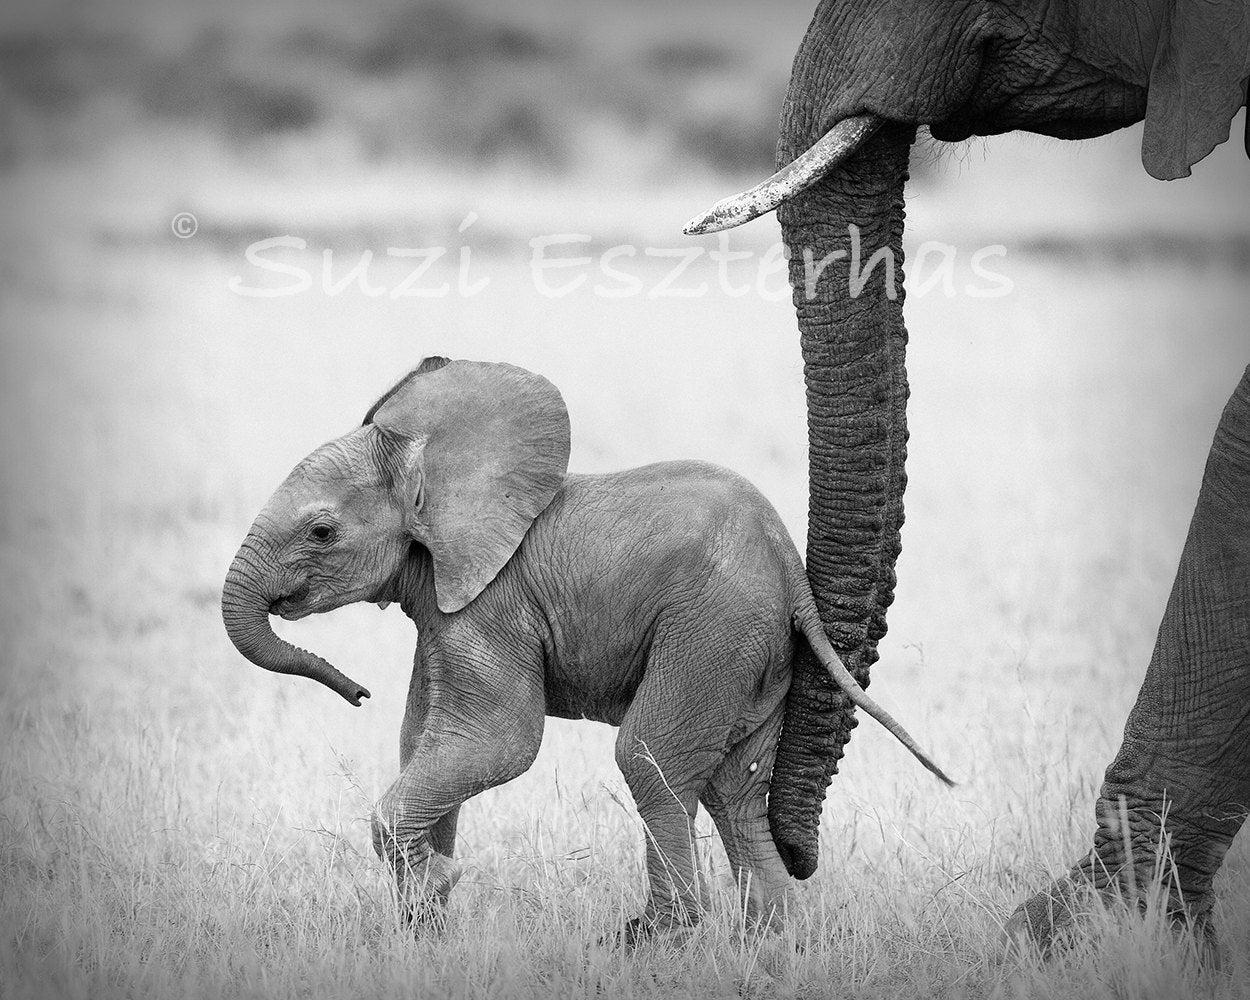 picture of safari animals safari baby animals set of 4 black white photos elephant safari animals of picture